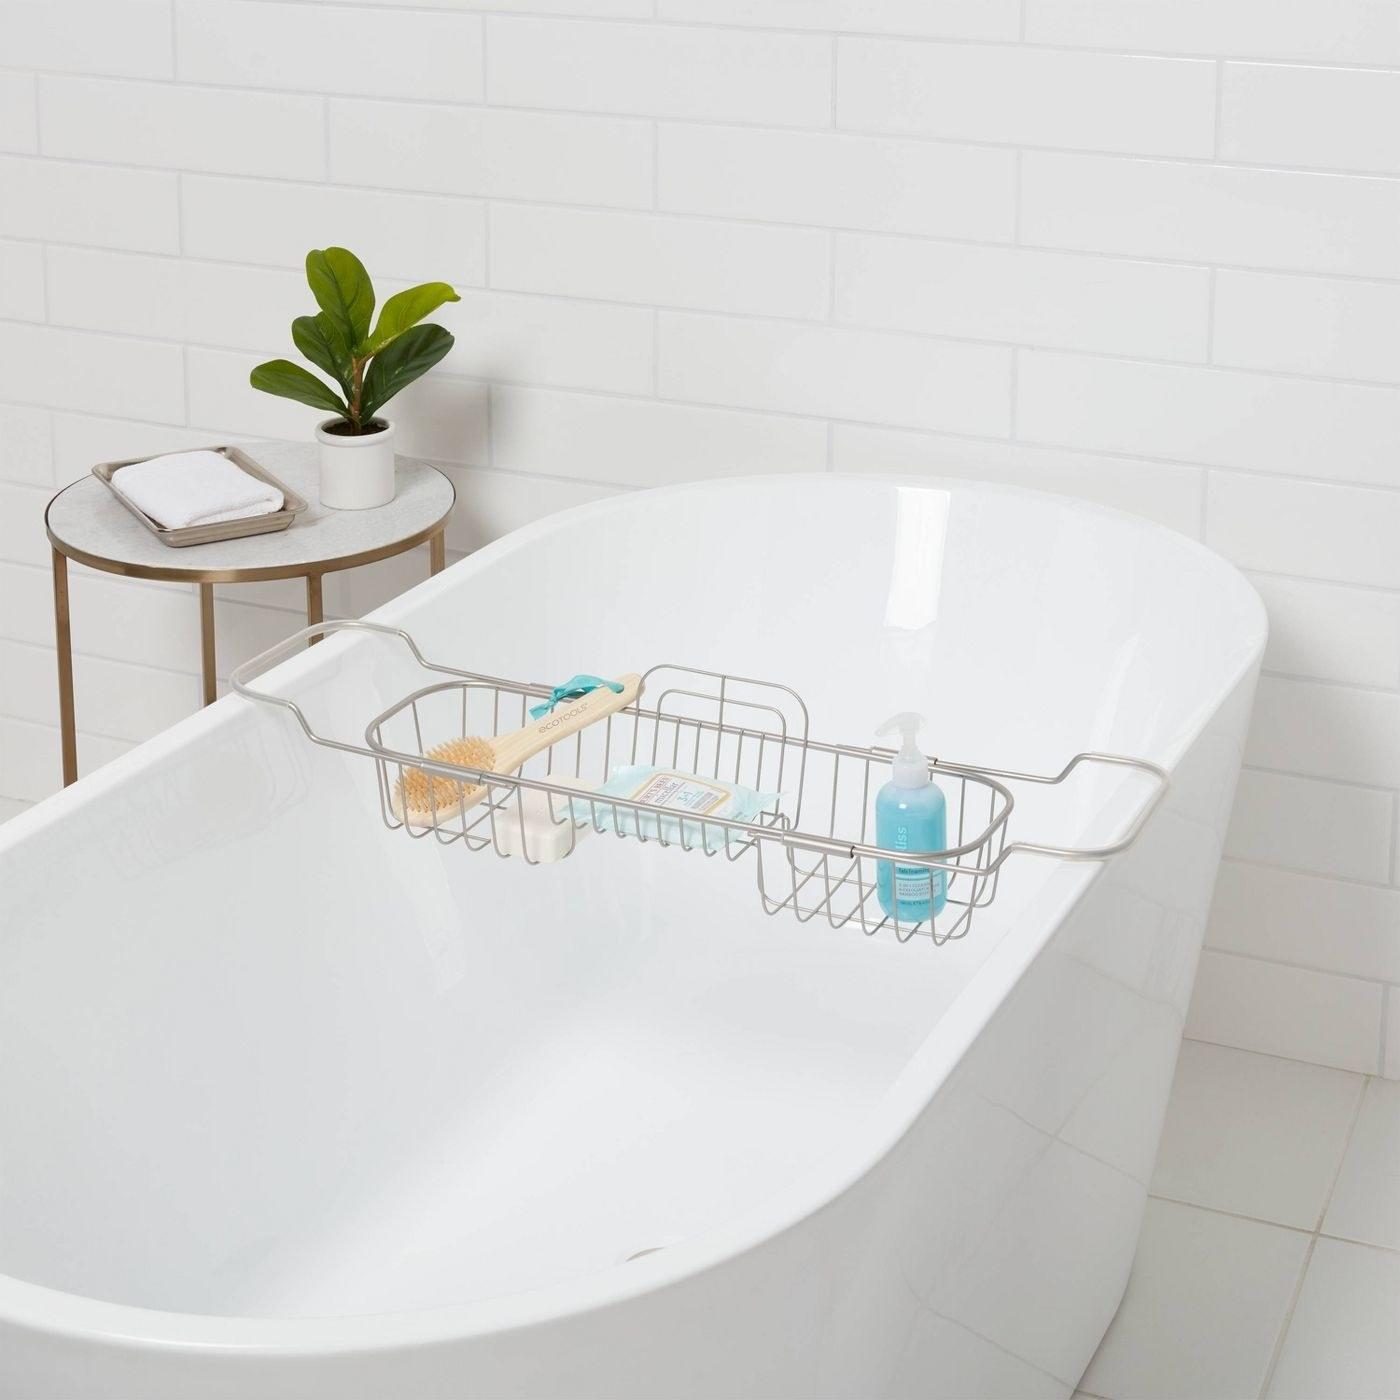 Satin bathtub caddy with wipes, soap and a tan bath brush